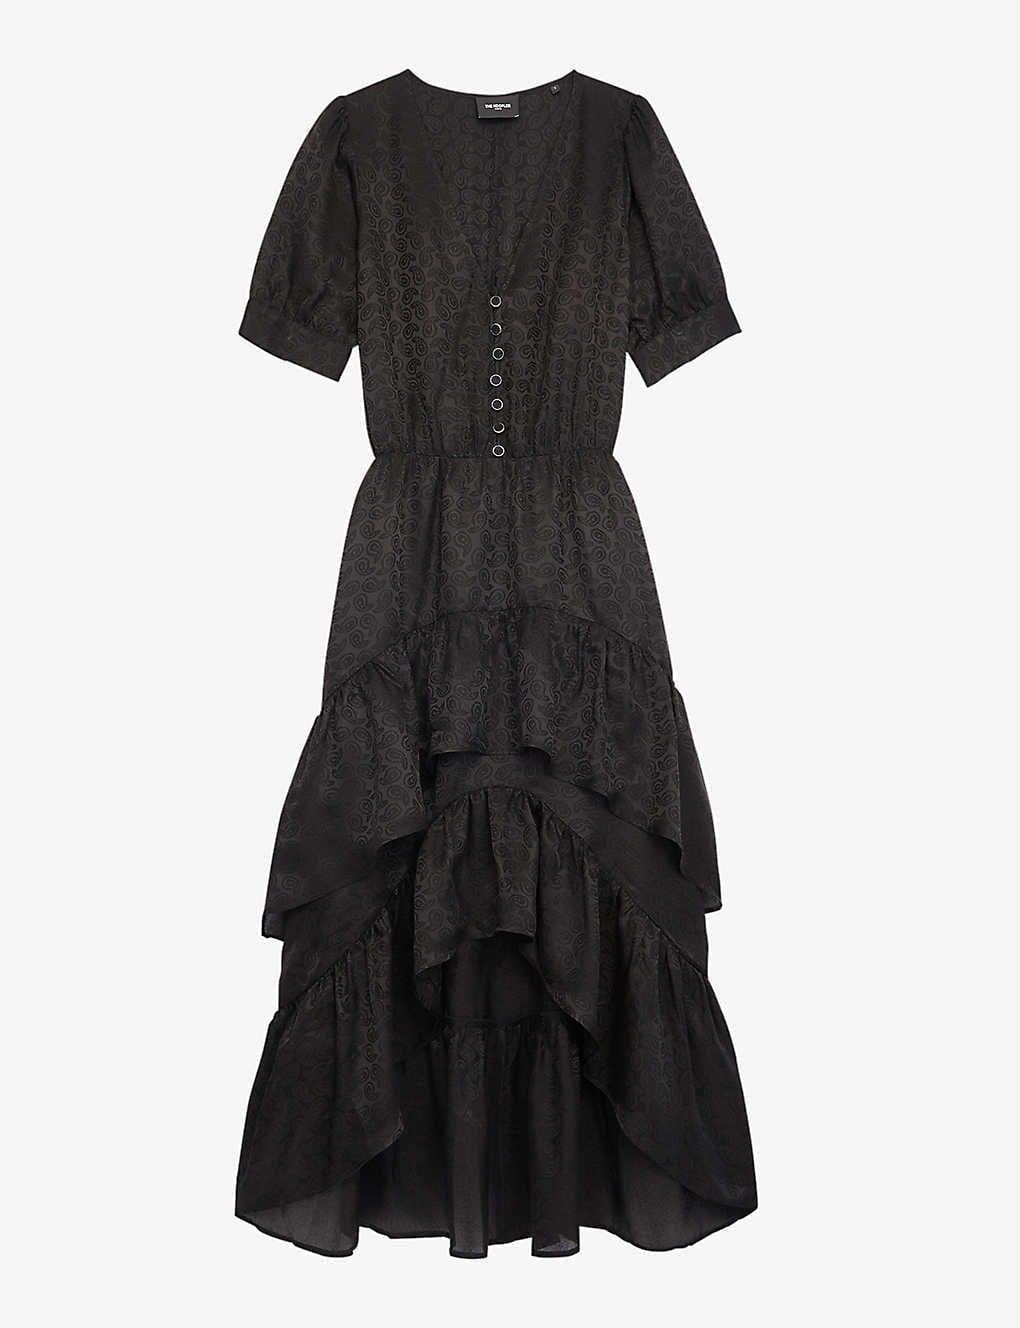 THE KOOPLES Ruffle-tiered Silk-crepe Dress